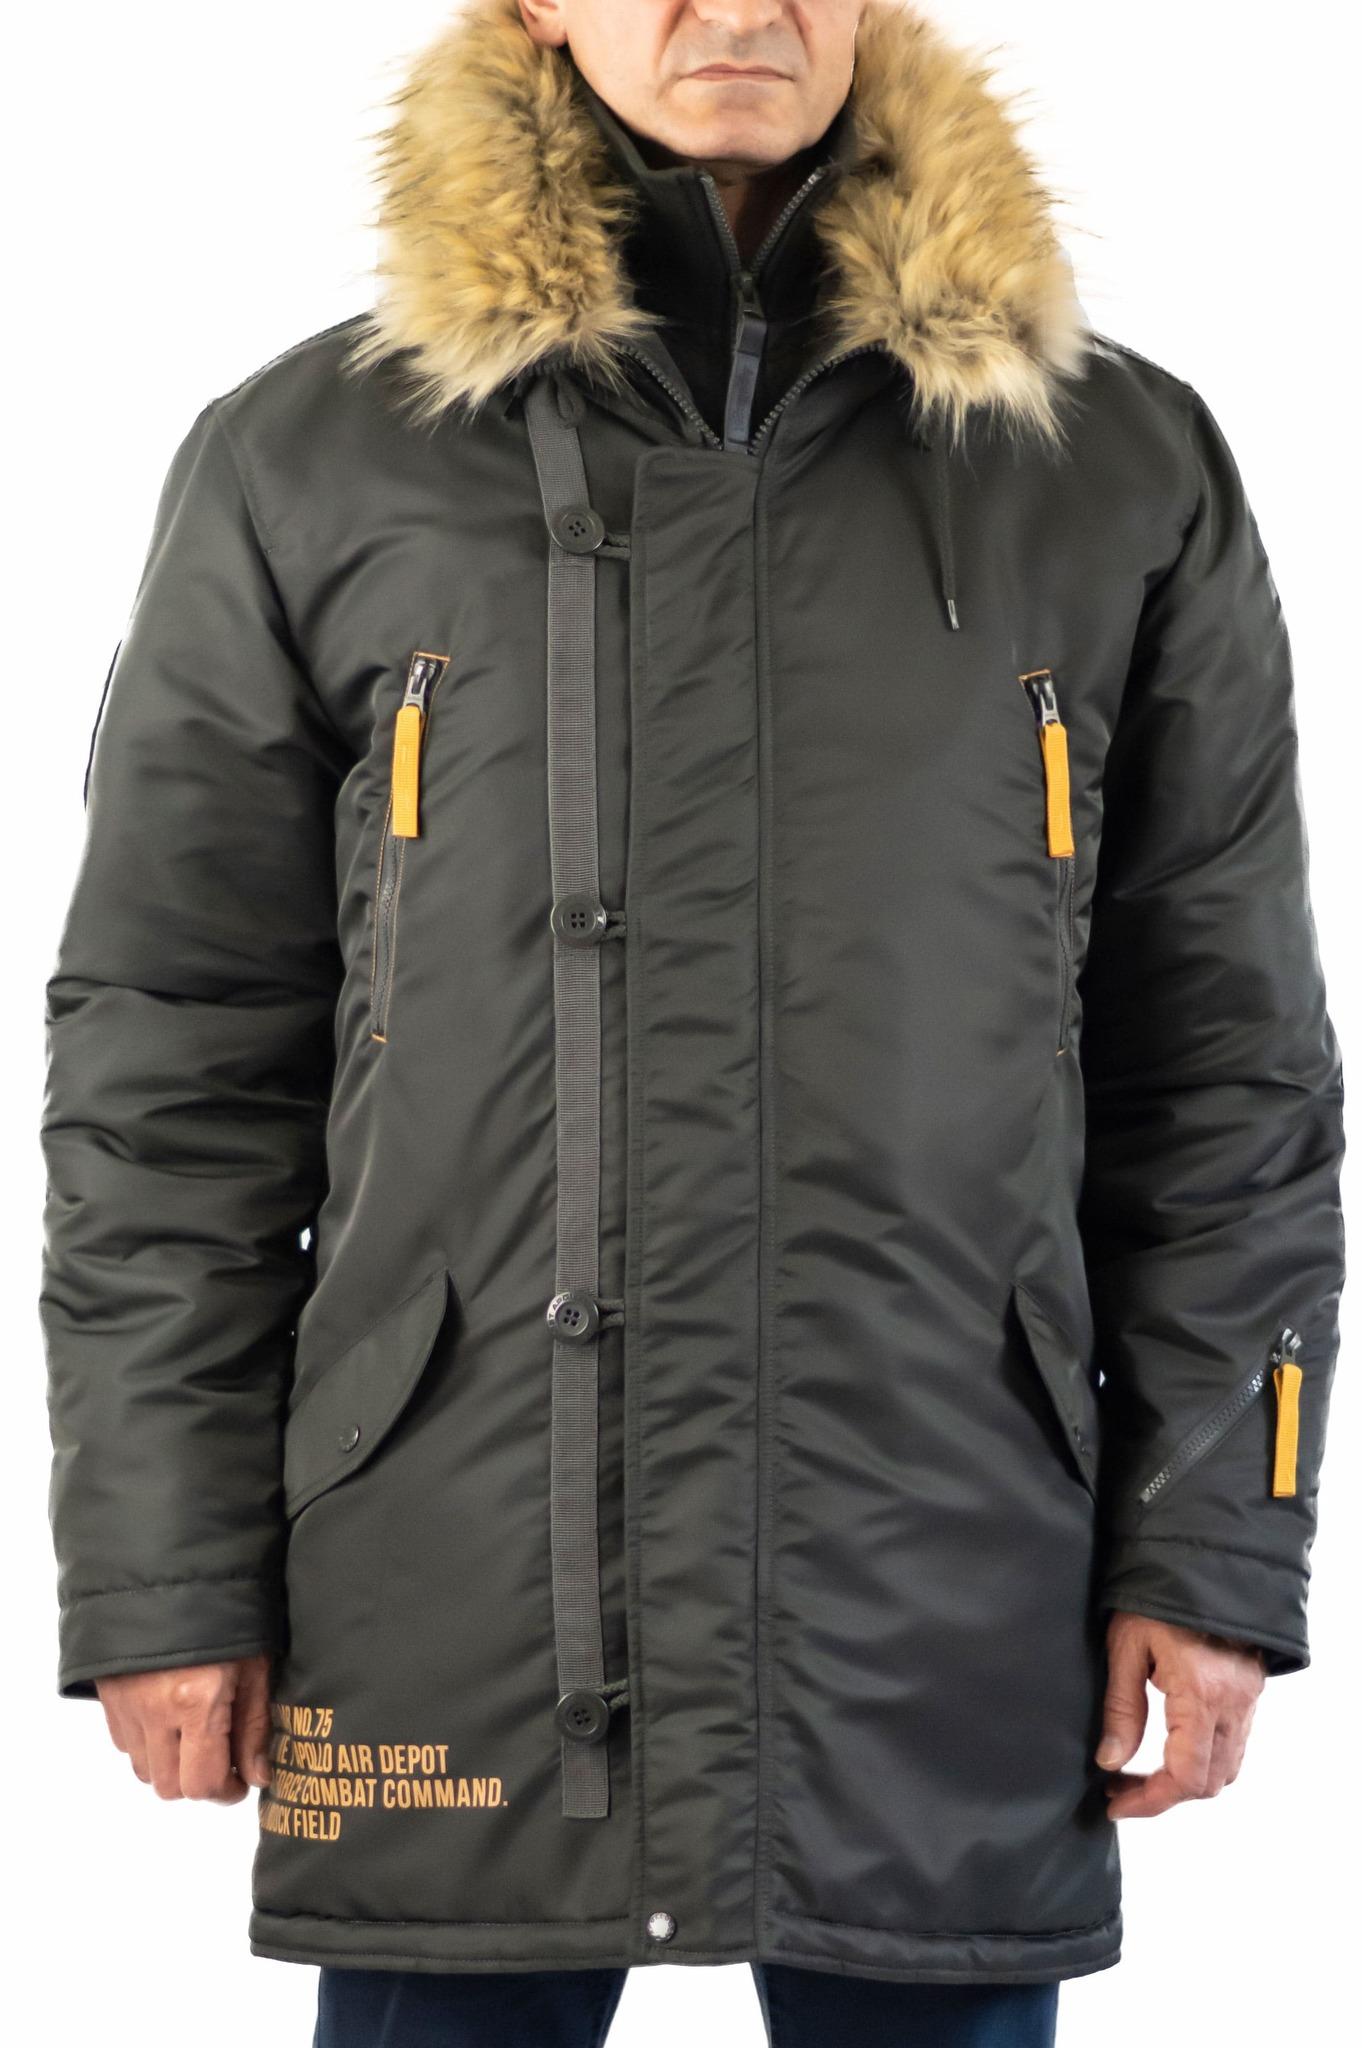 Куртка Аляска  Apolloget Arctic 2019 (т.серый - beluga)